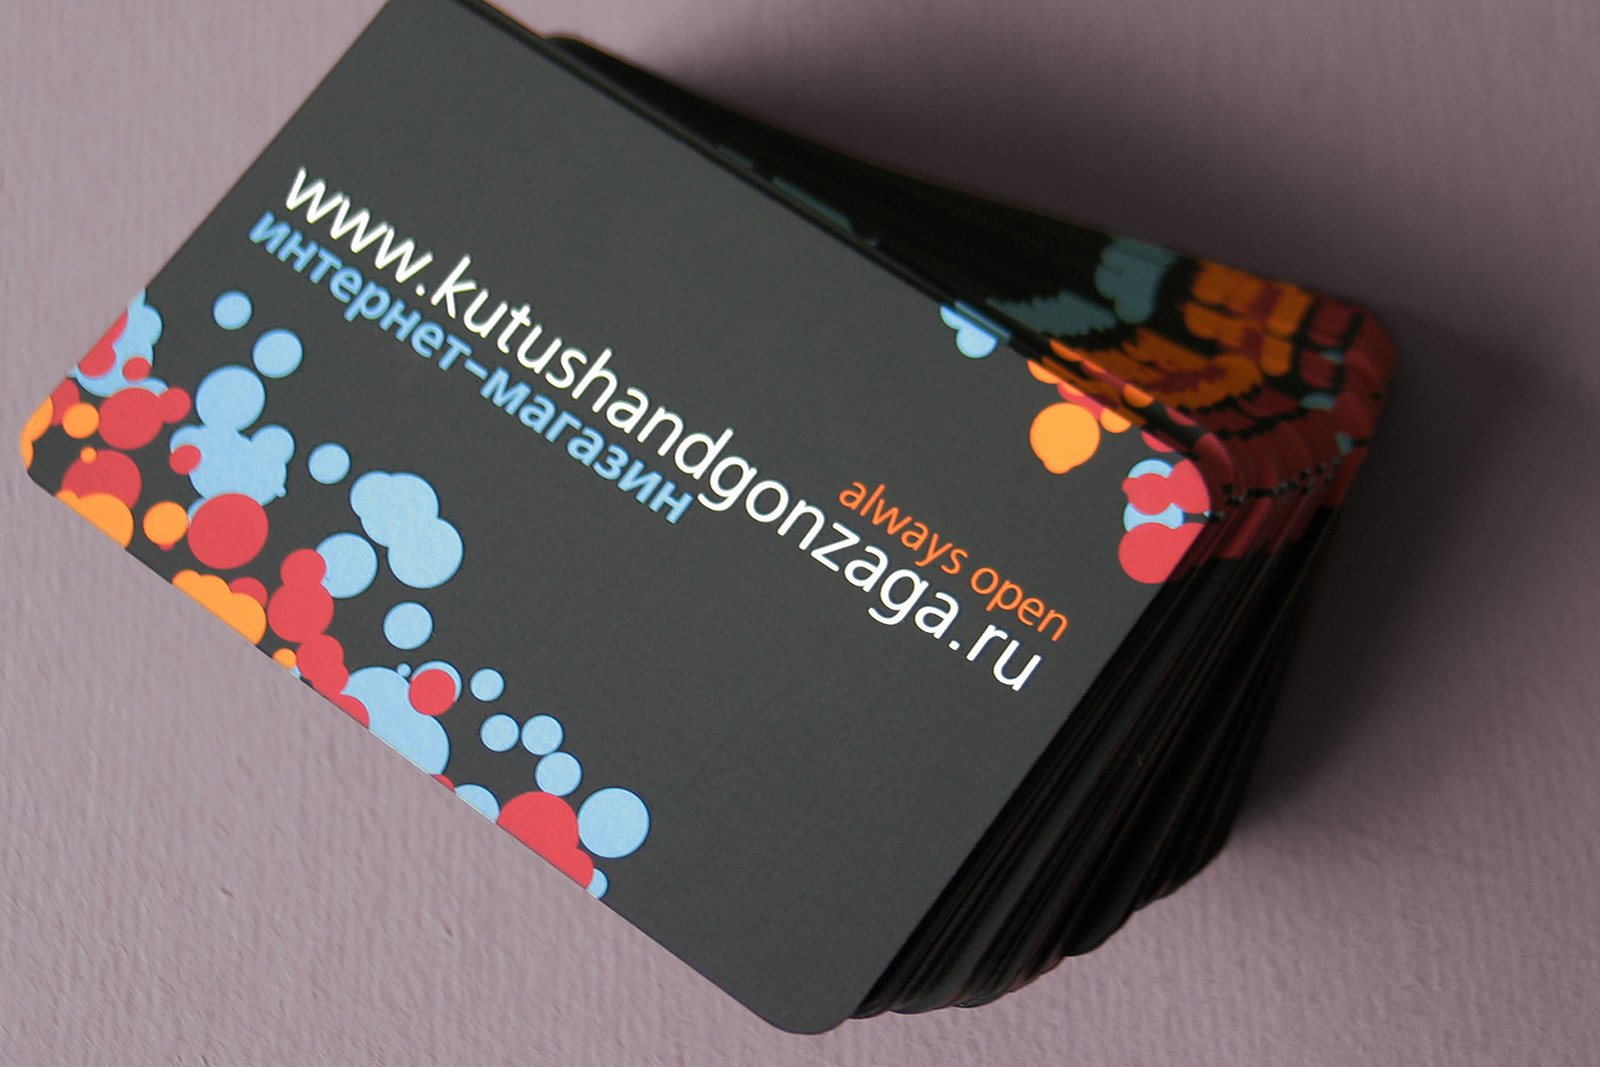 Асгард Брендинг, фирменный стиль, айдентика, лого, K&G, Kutush & Gonzaga, дизайн, графический дизайн, фирменный паттерн, дизайн визитных карточек, брендинг магазина, реклама, ритейл, интернет-магазин, брендинг, корпоративный стиль